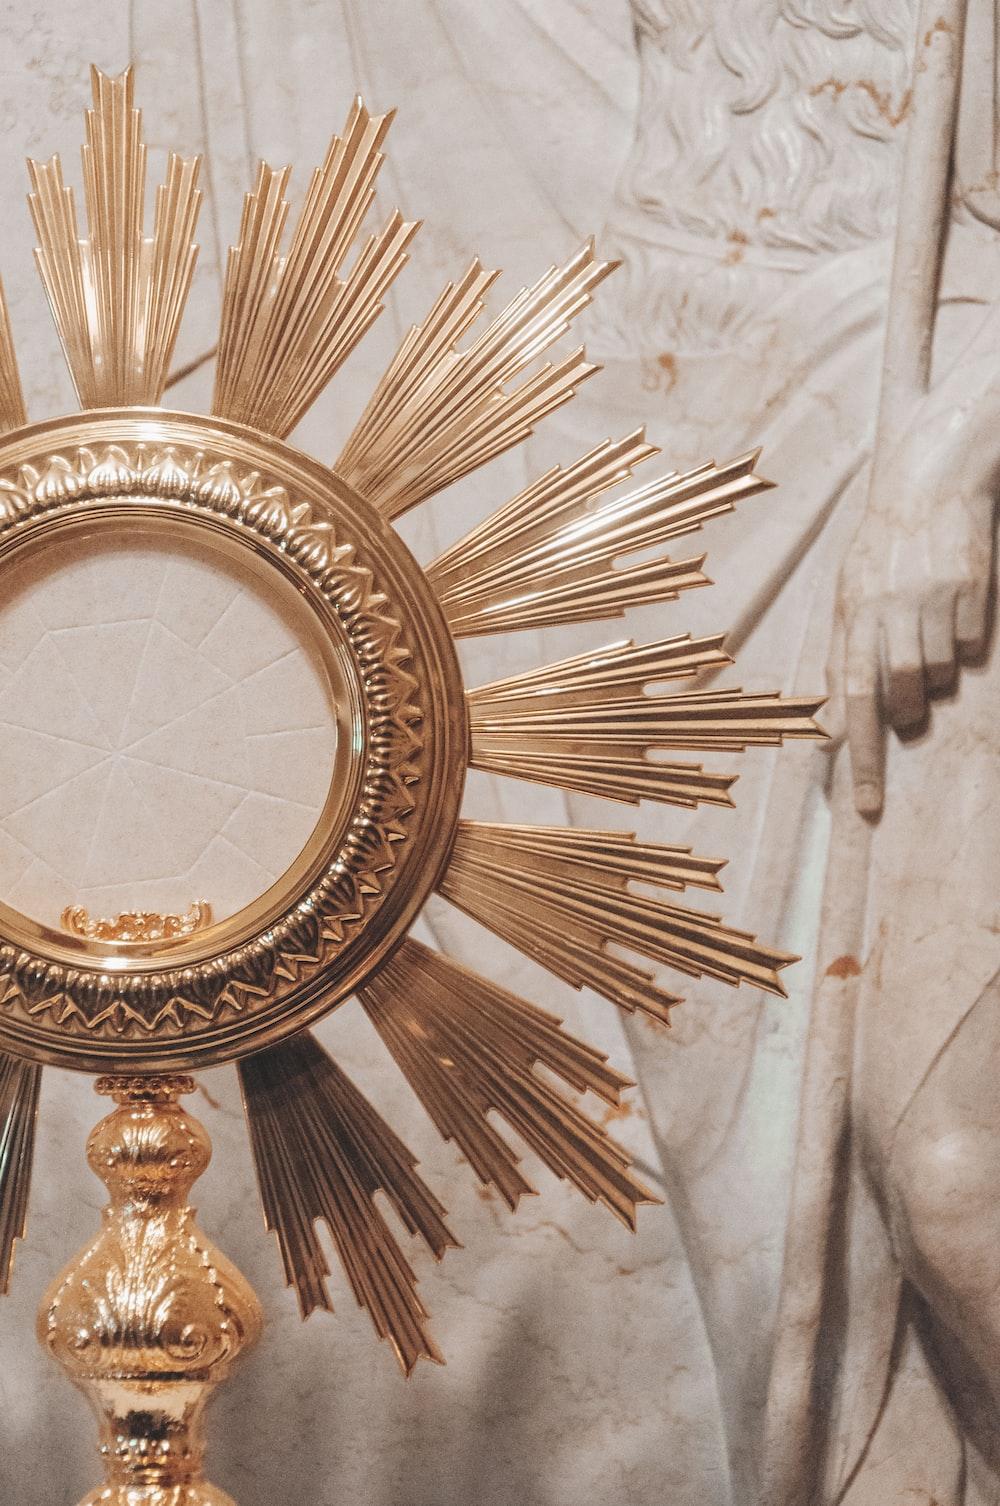 gold round framed mirror on white textile